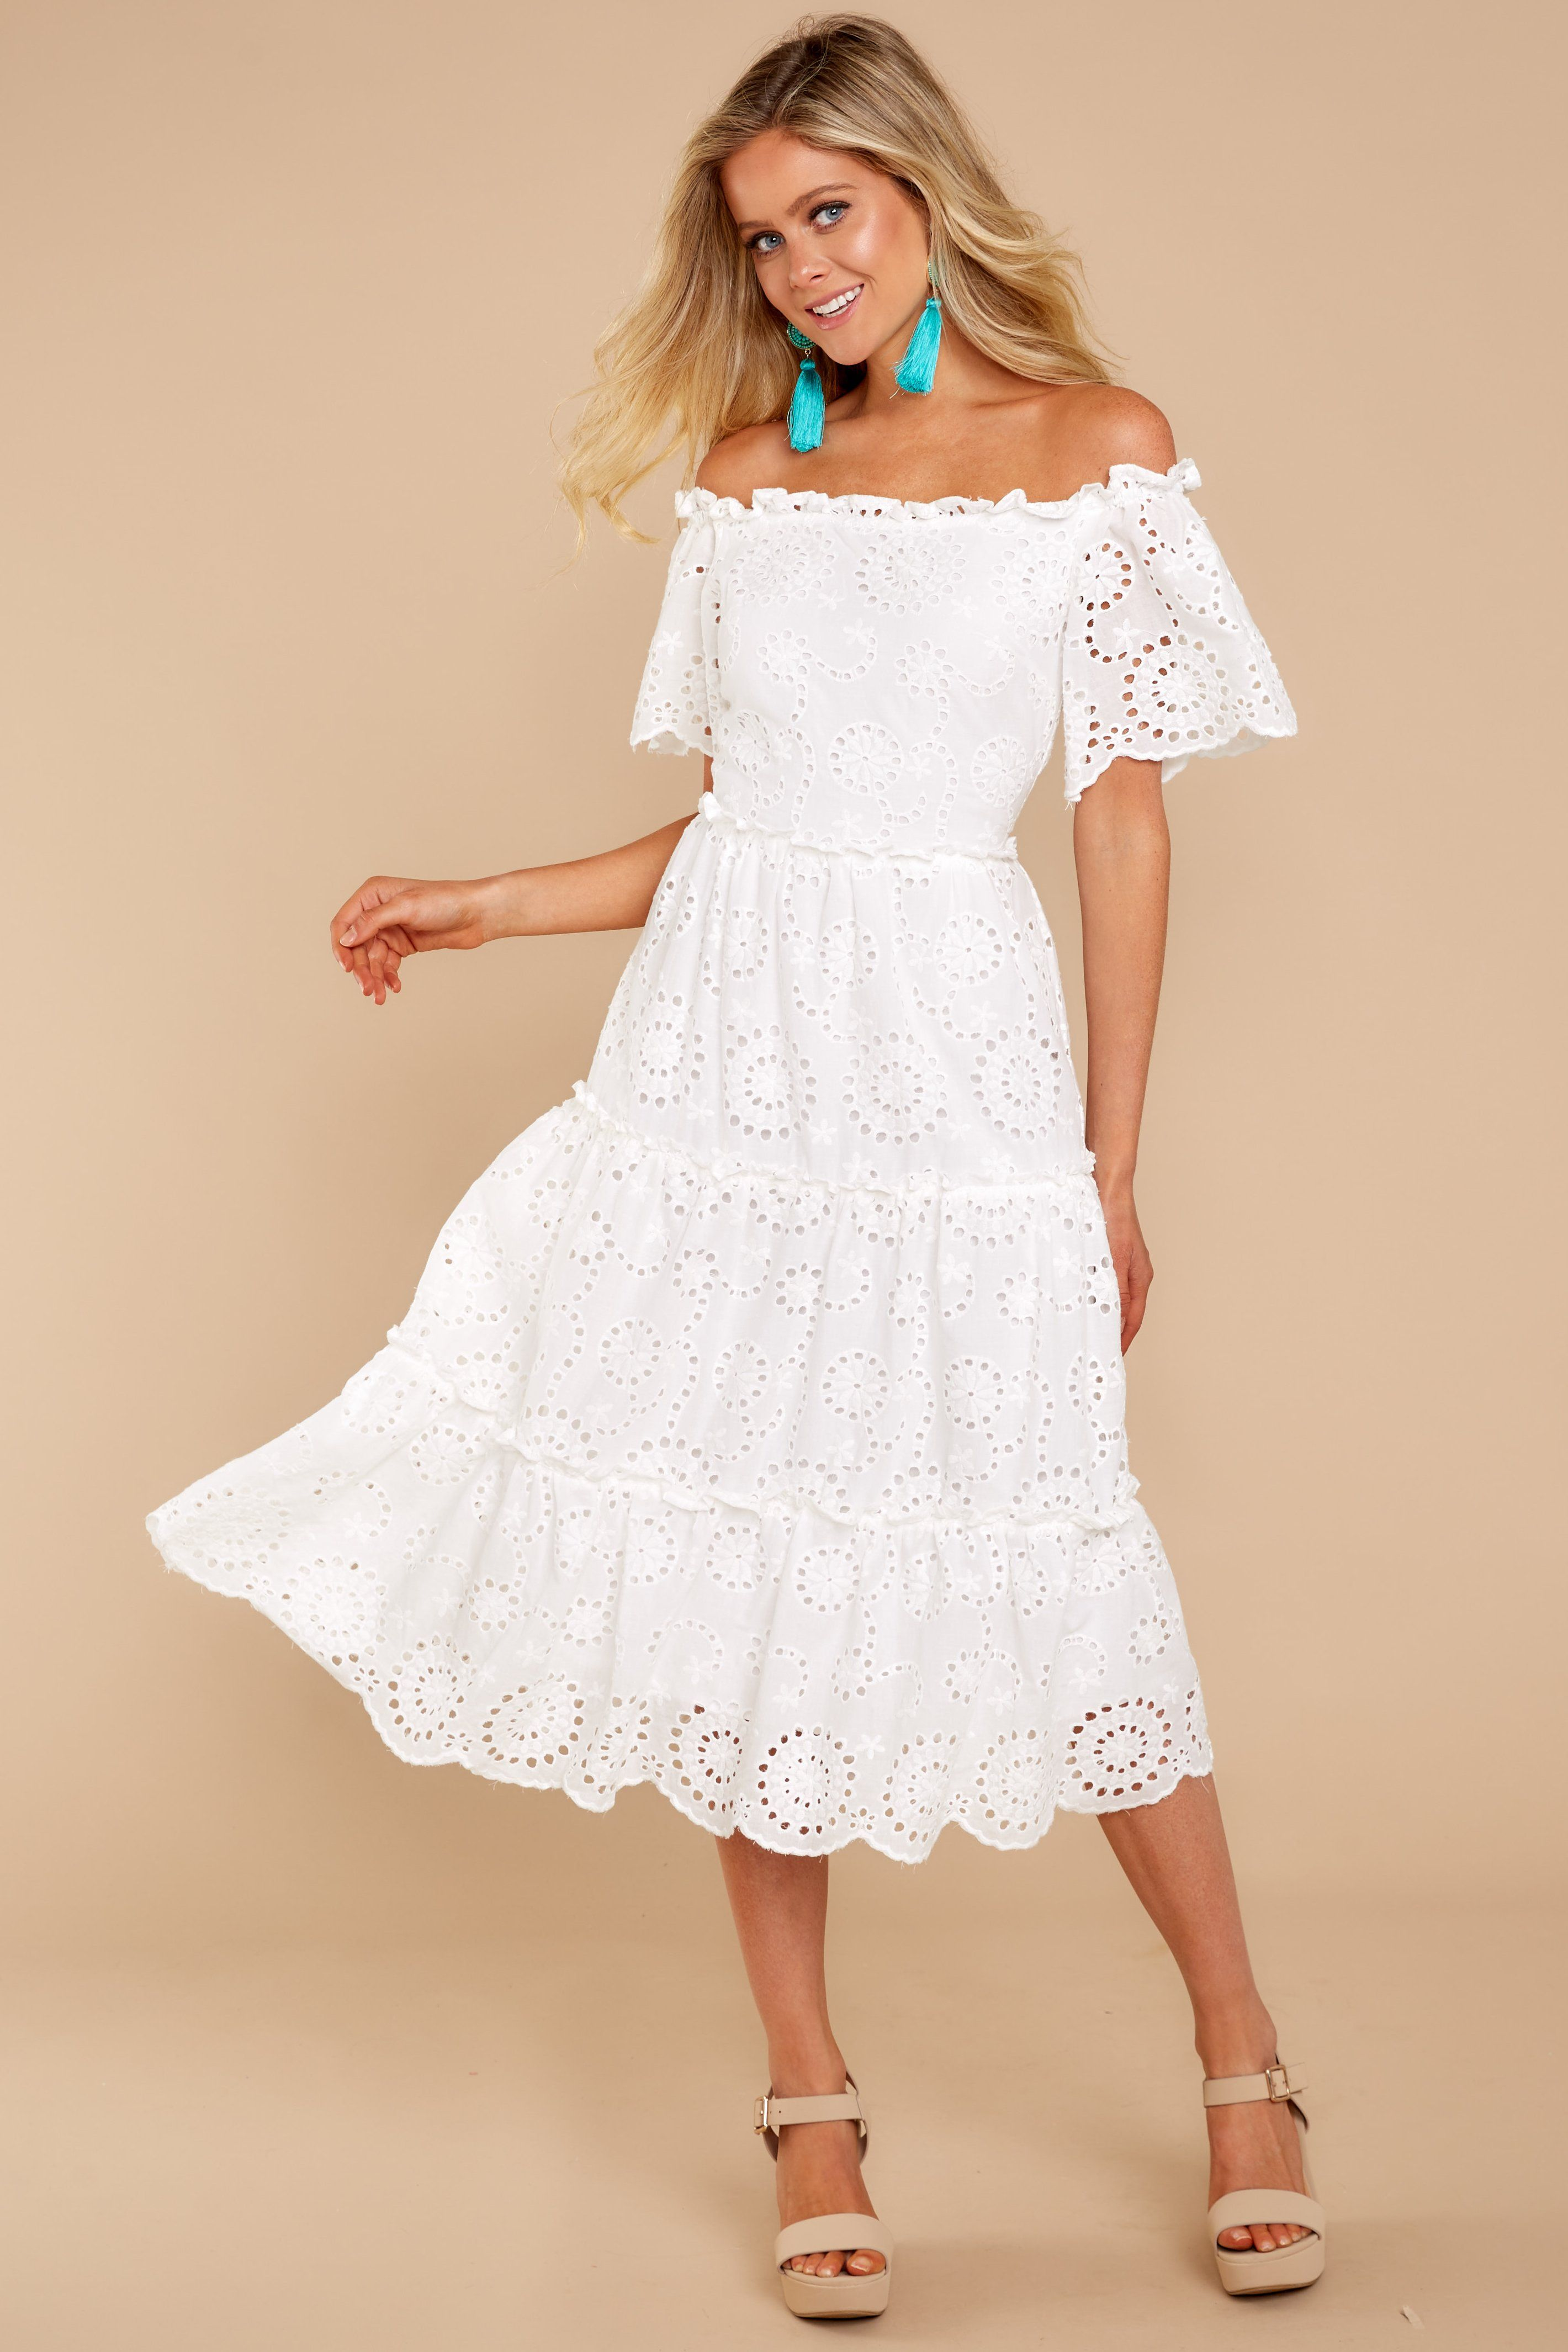 Chic White Eyelet Dress Trendy Eyelet Dress Dress 64 00 Red Dress Boutique White Eyelet Dress White Boho Dress White Lace Dress Boho [ 4260 x 2840 Pixel ]